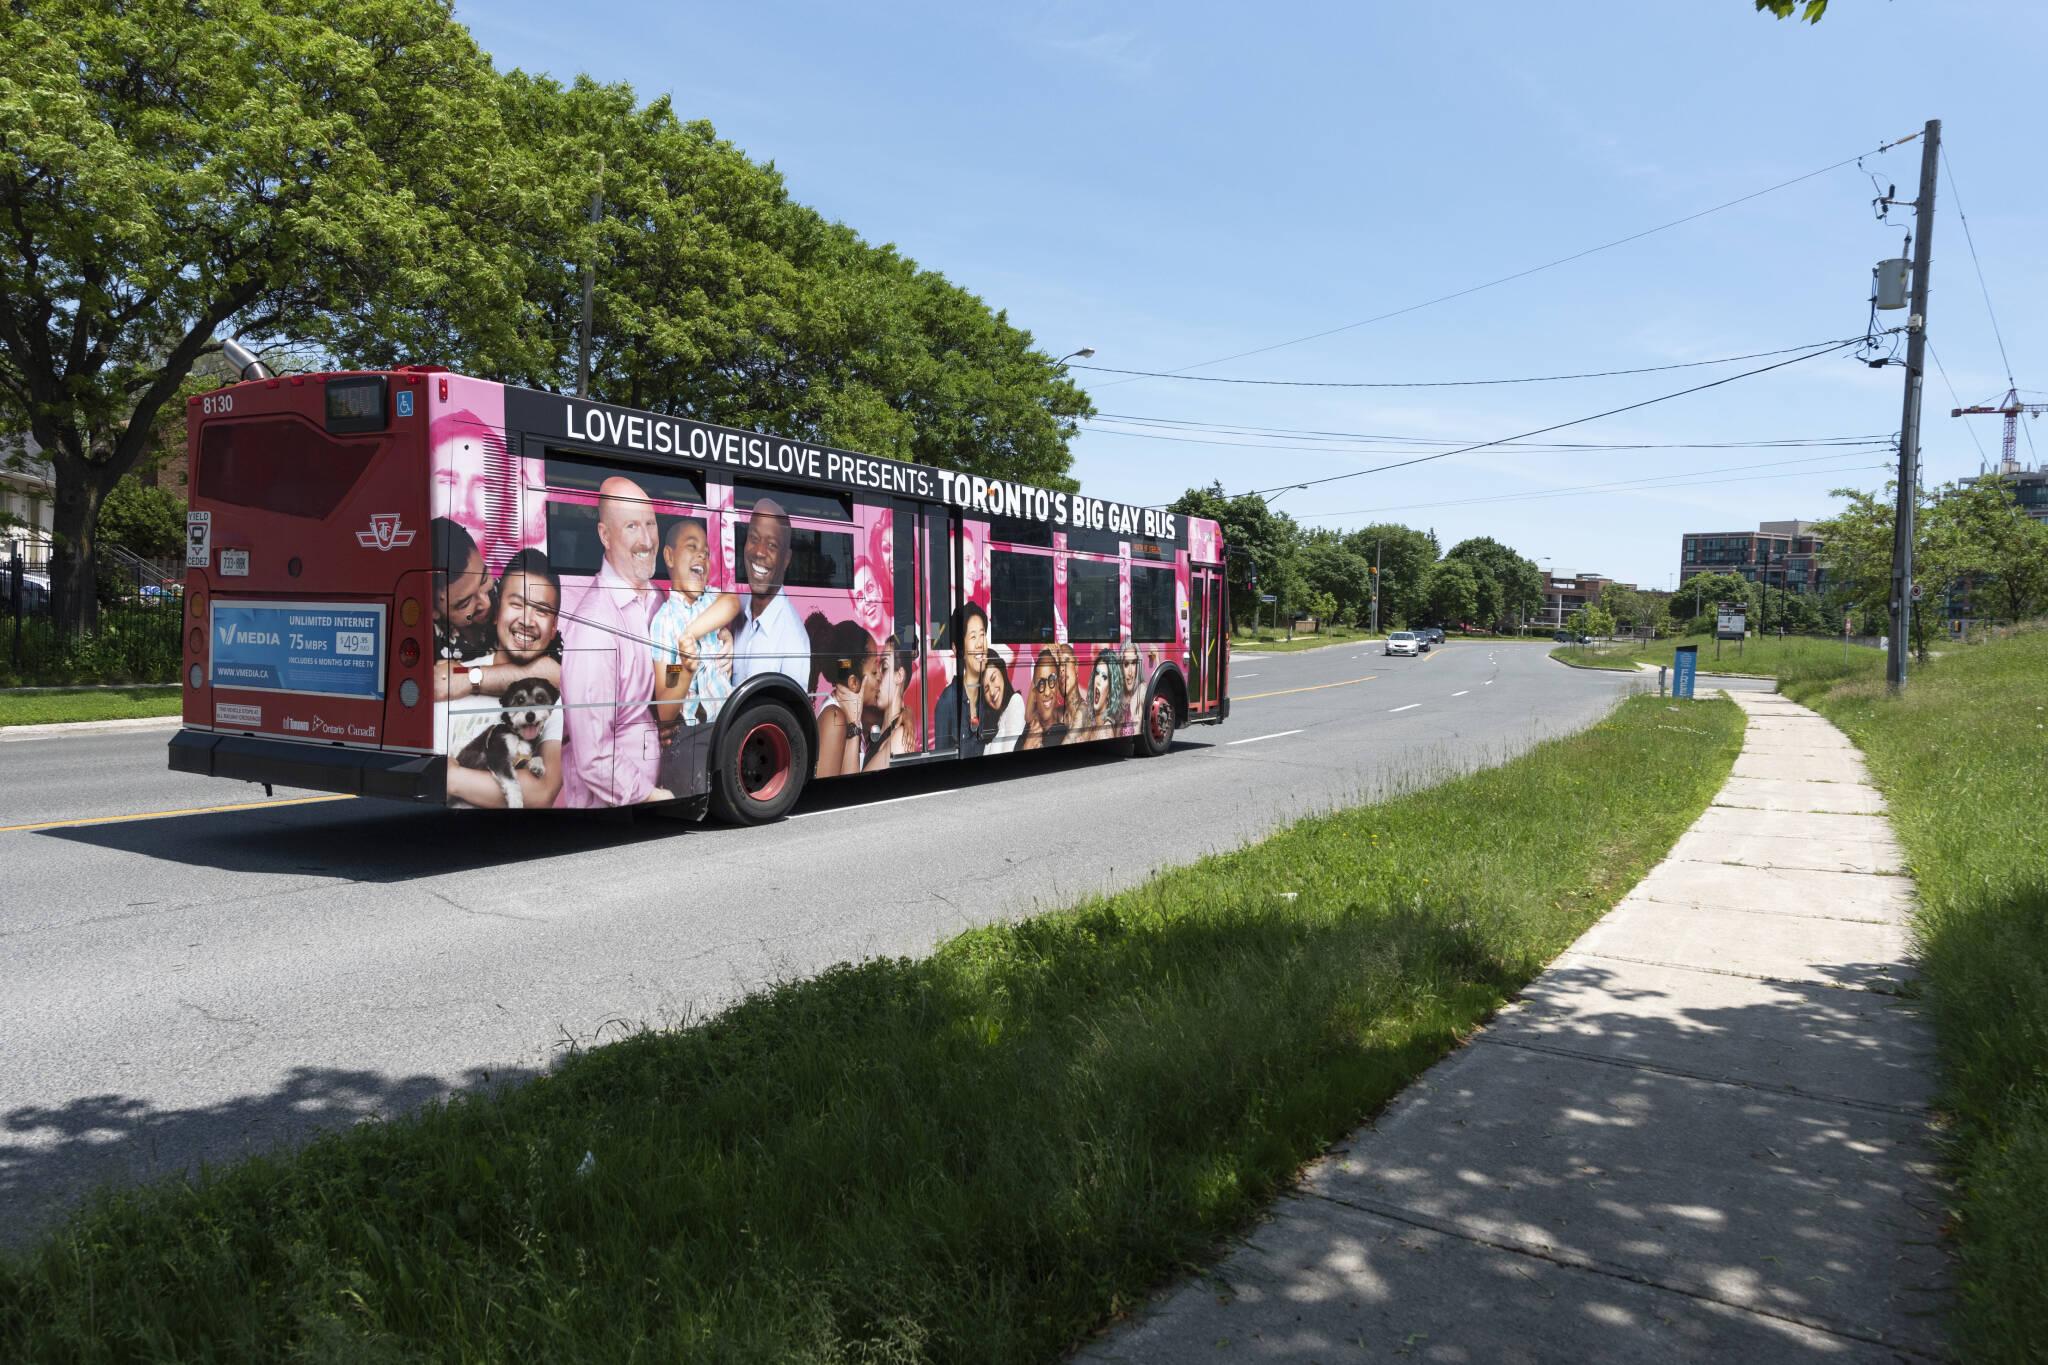 Big Gay Bus Toronto